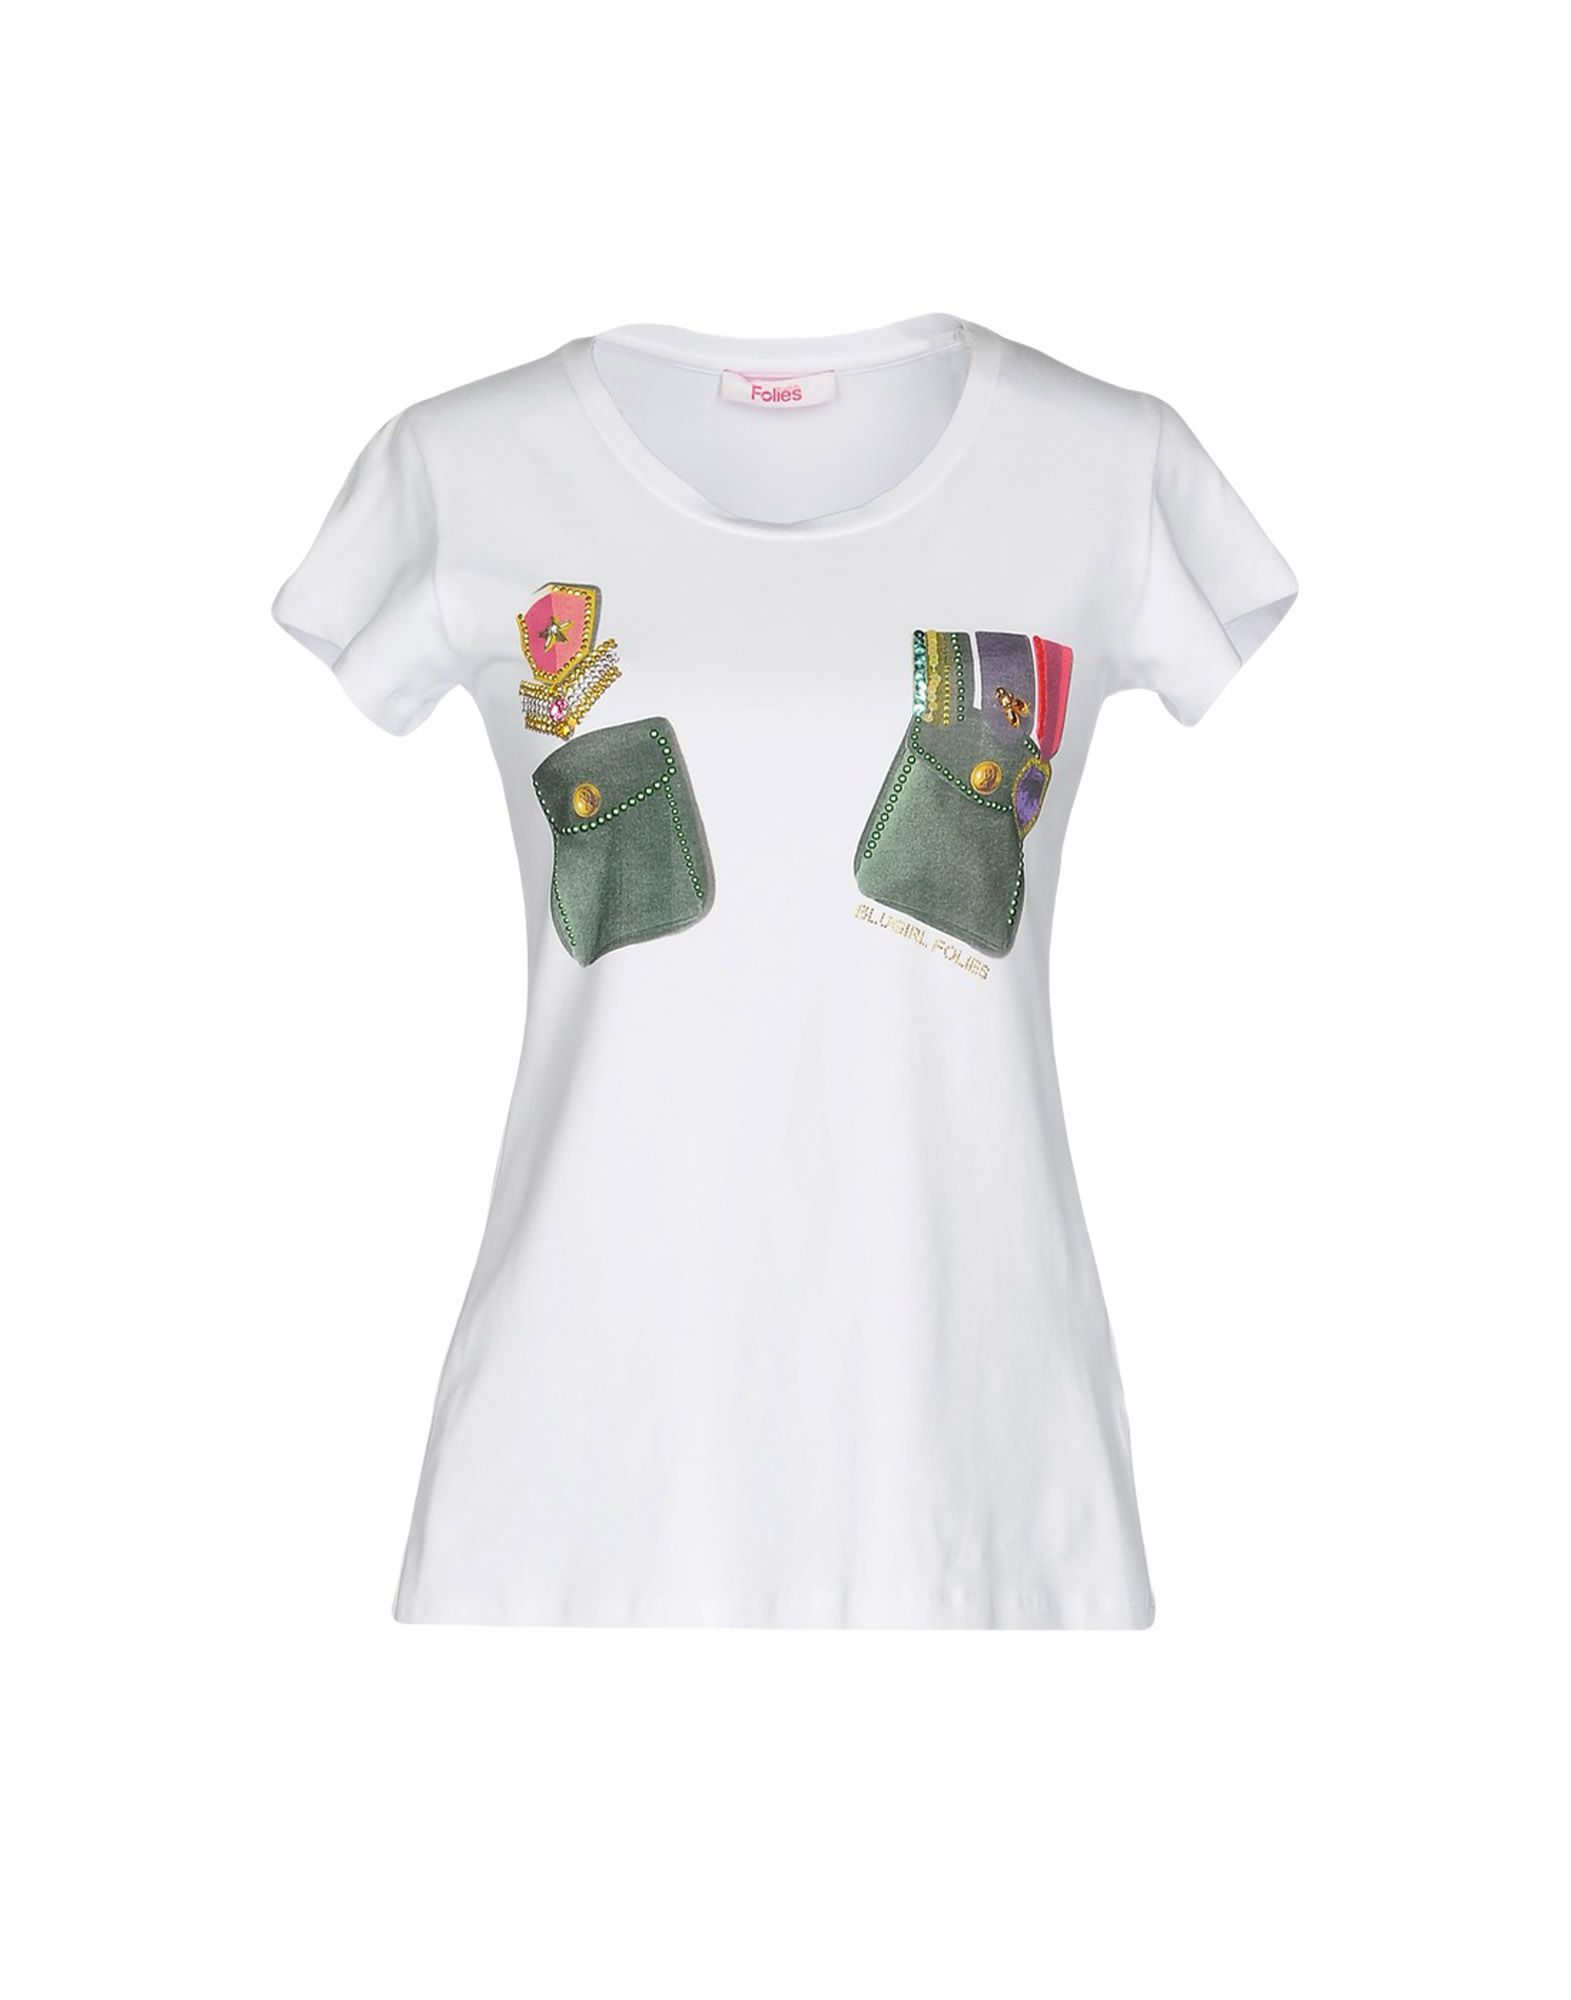 T-Shirt Blugirl Folies Donna - Acquista online su 2YO9kvxP